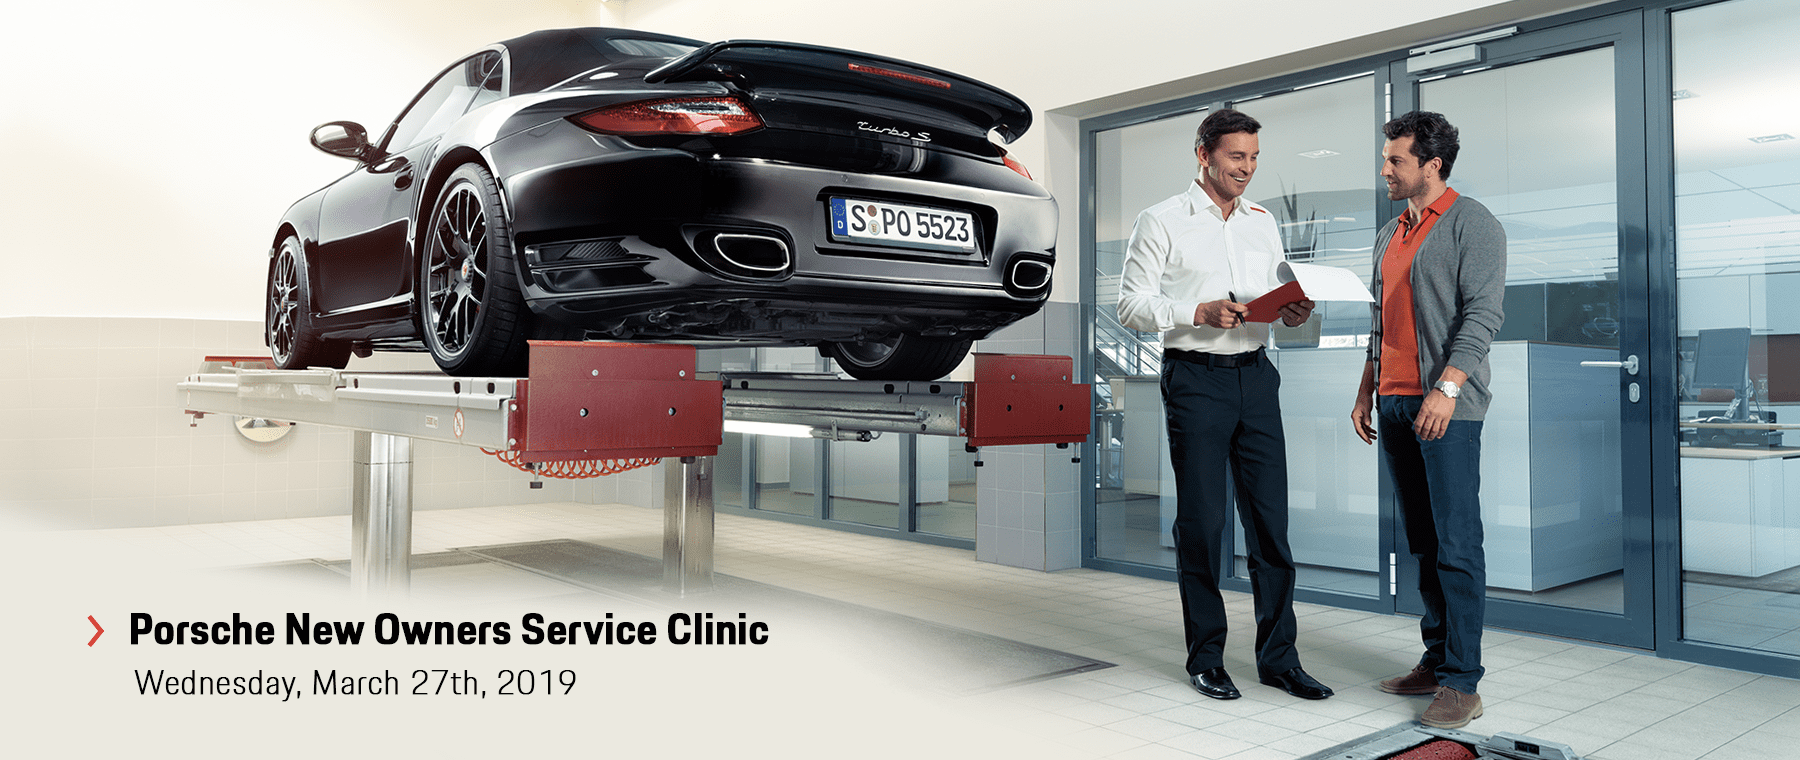 Porsche New Owner's Service Clinic